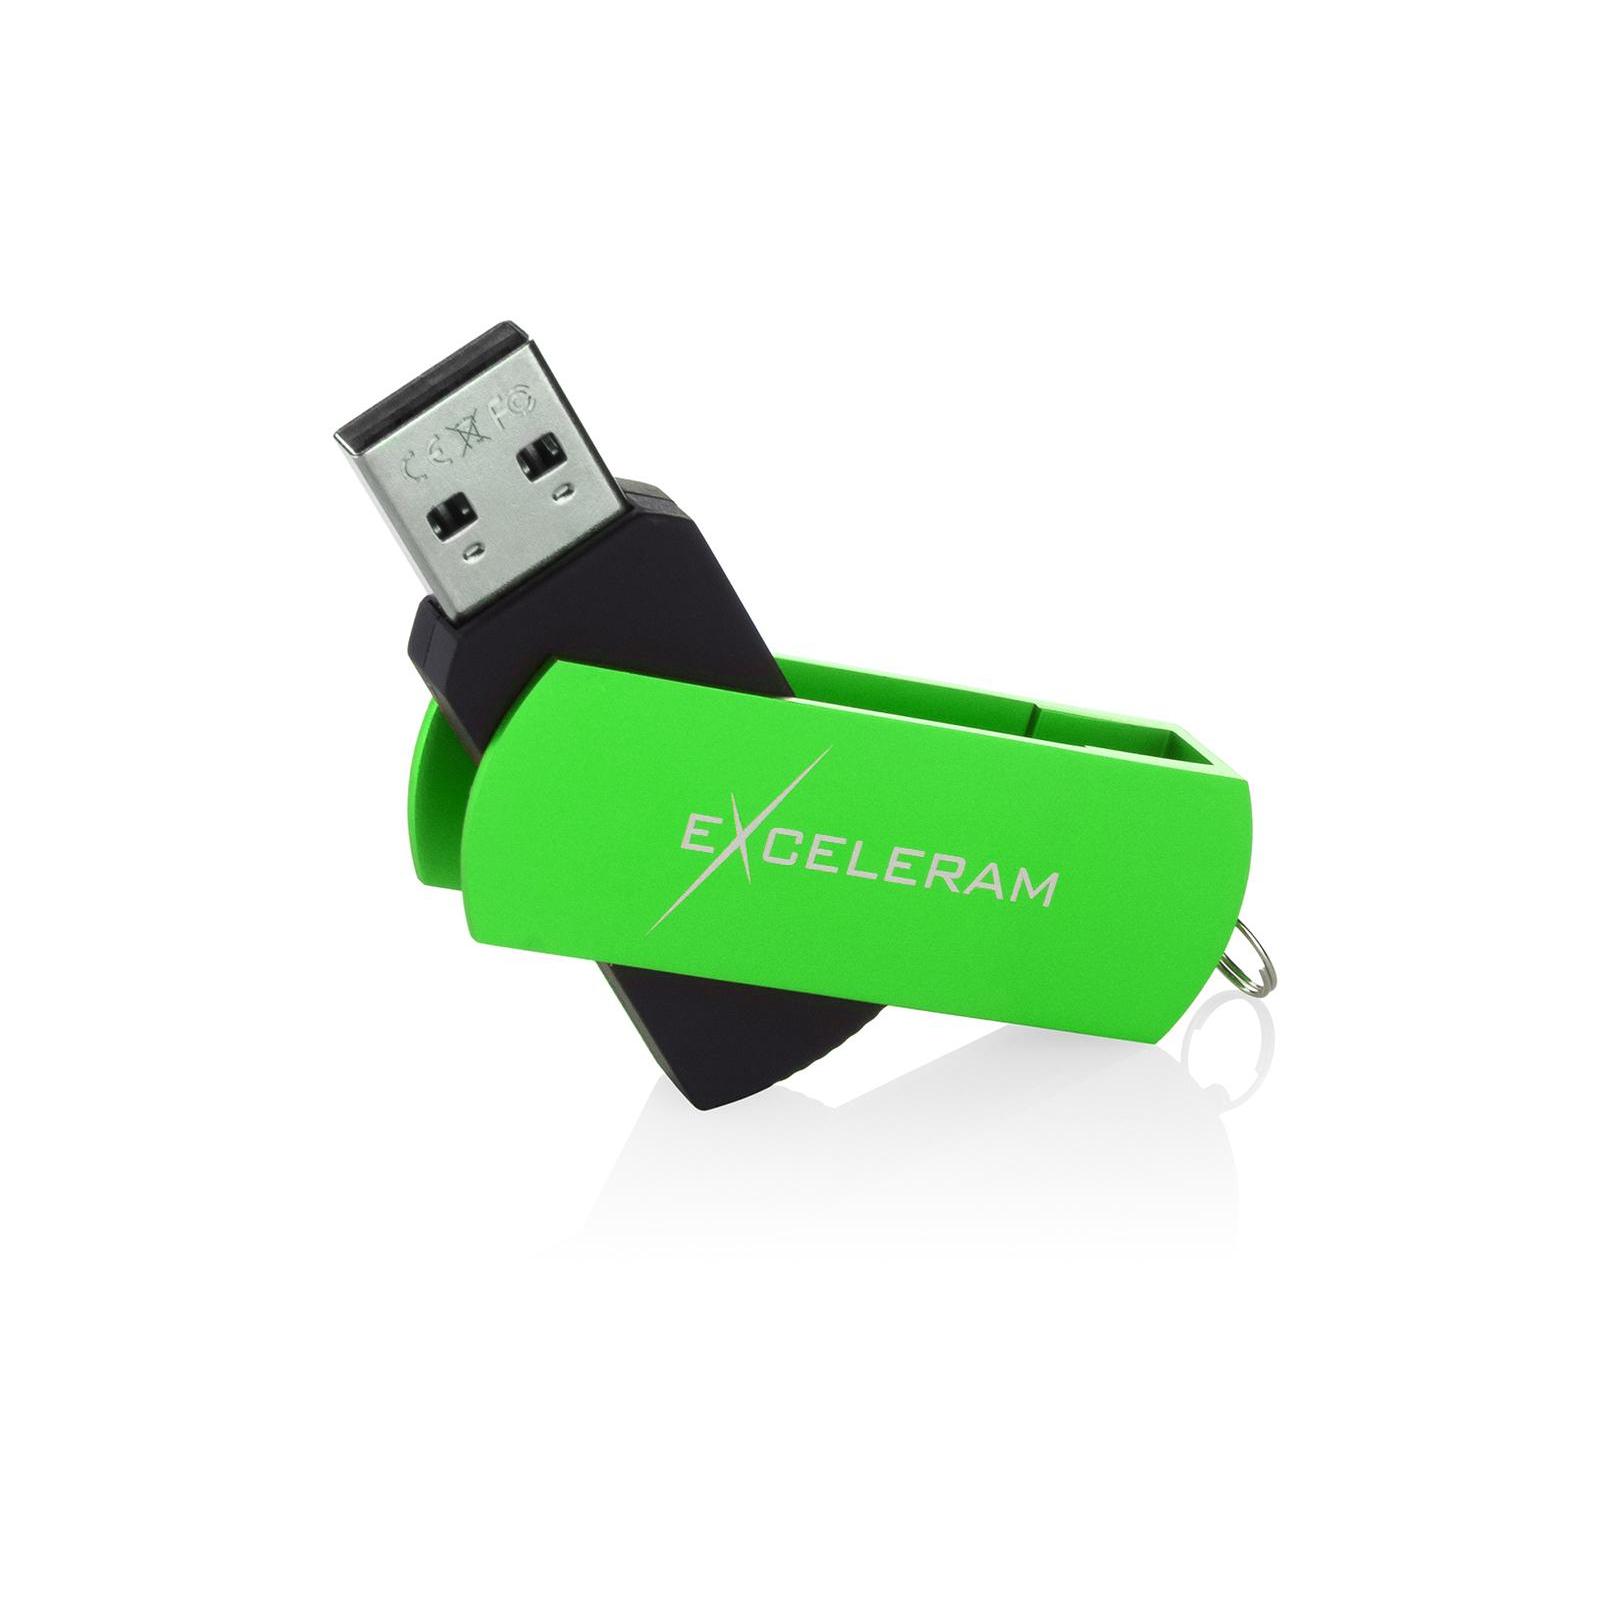 USB флеш накопитель eXceleram 64GB P2 Series Red/Black USB 2.0 (EXP2U2REB64) изображение 3